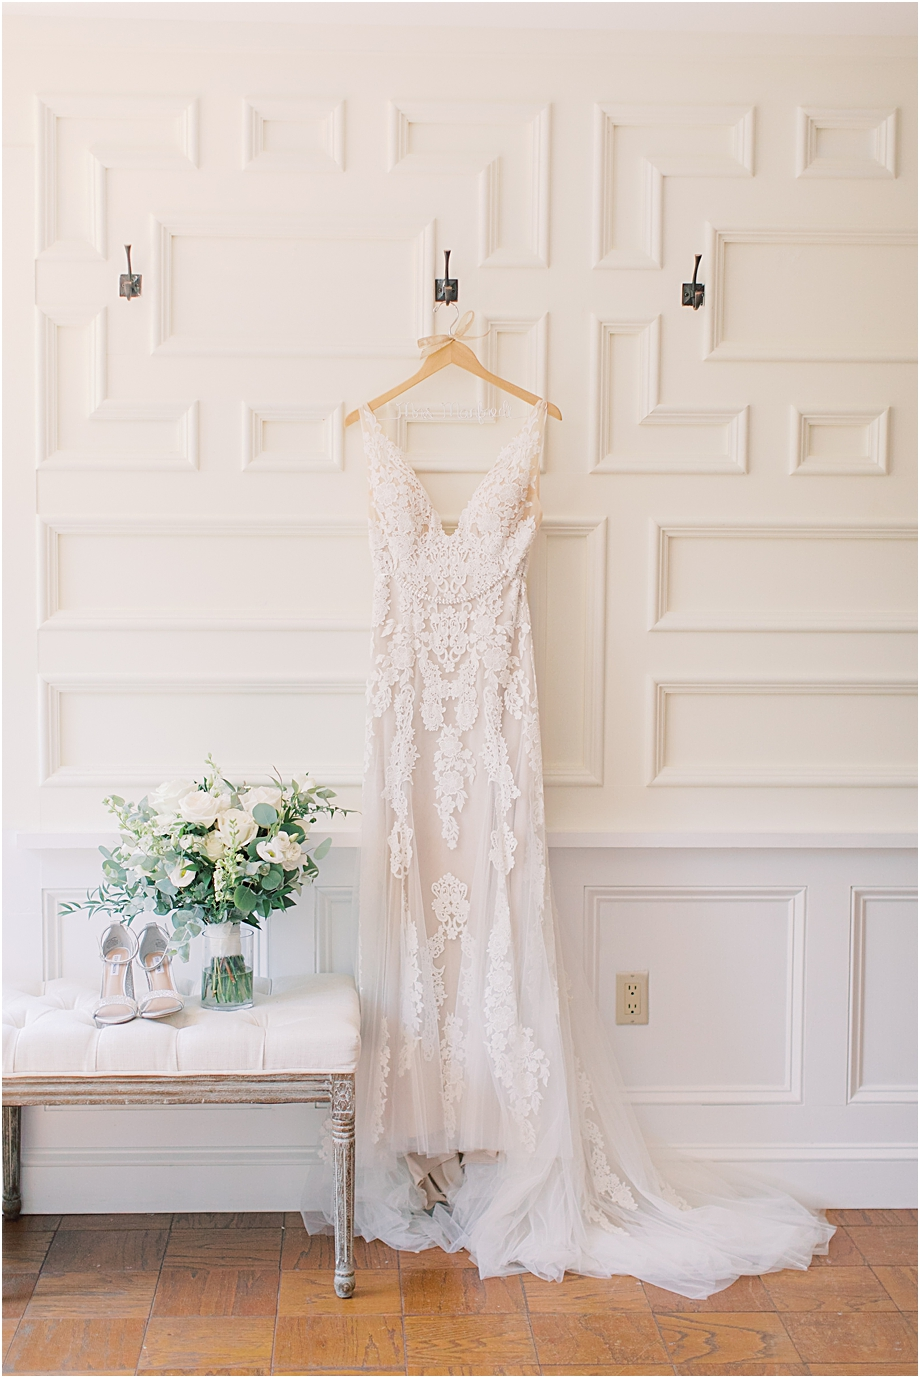 wedding dress hanging | Hotel Du Village Wedding